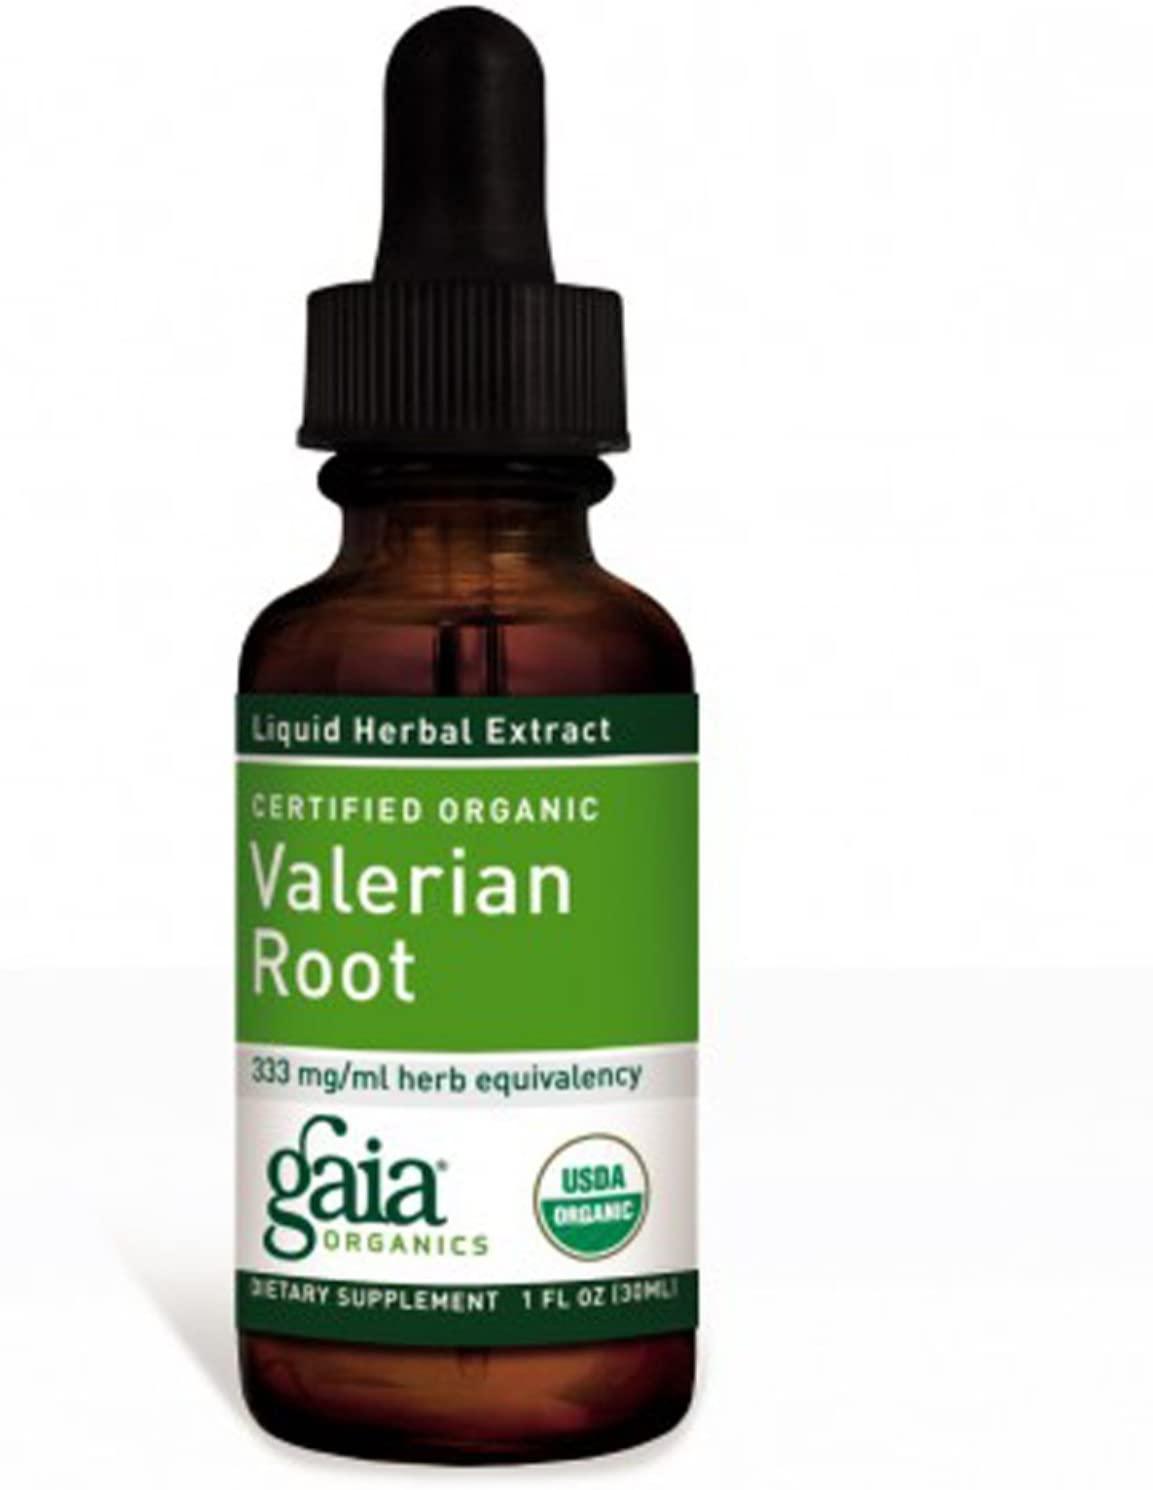 gia herbs valerian root